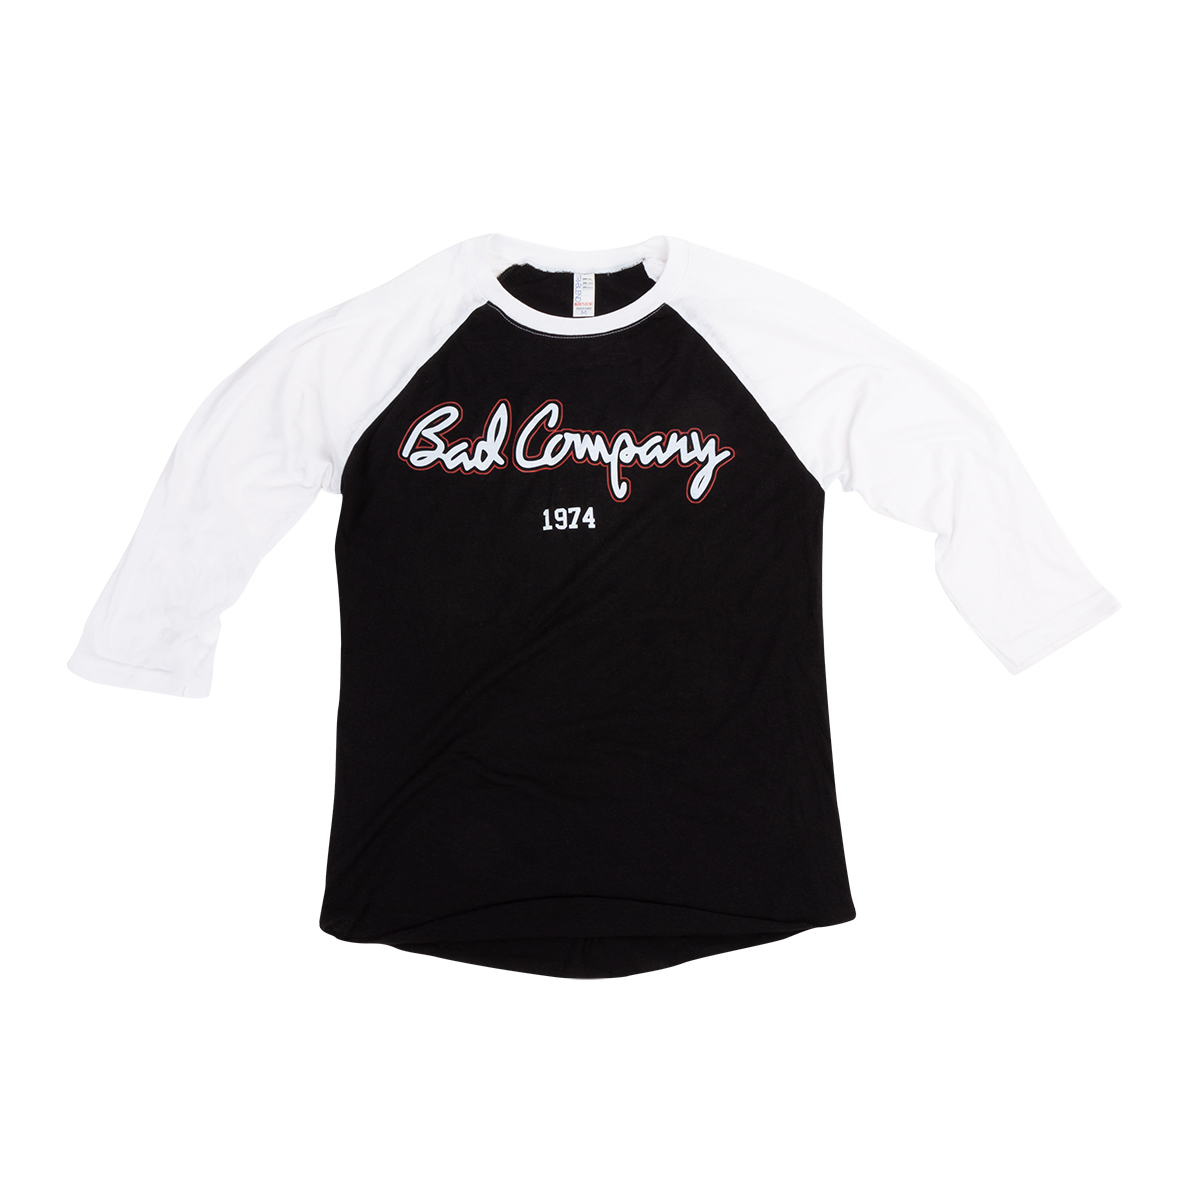 Bad Company 1974 Raglan